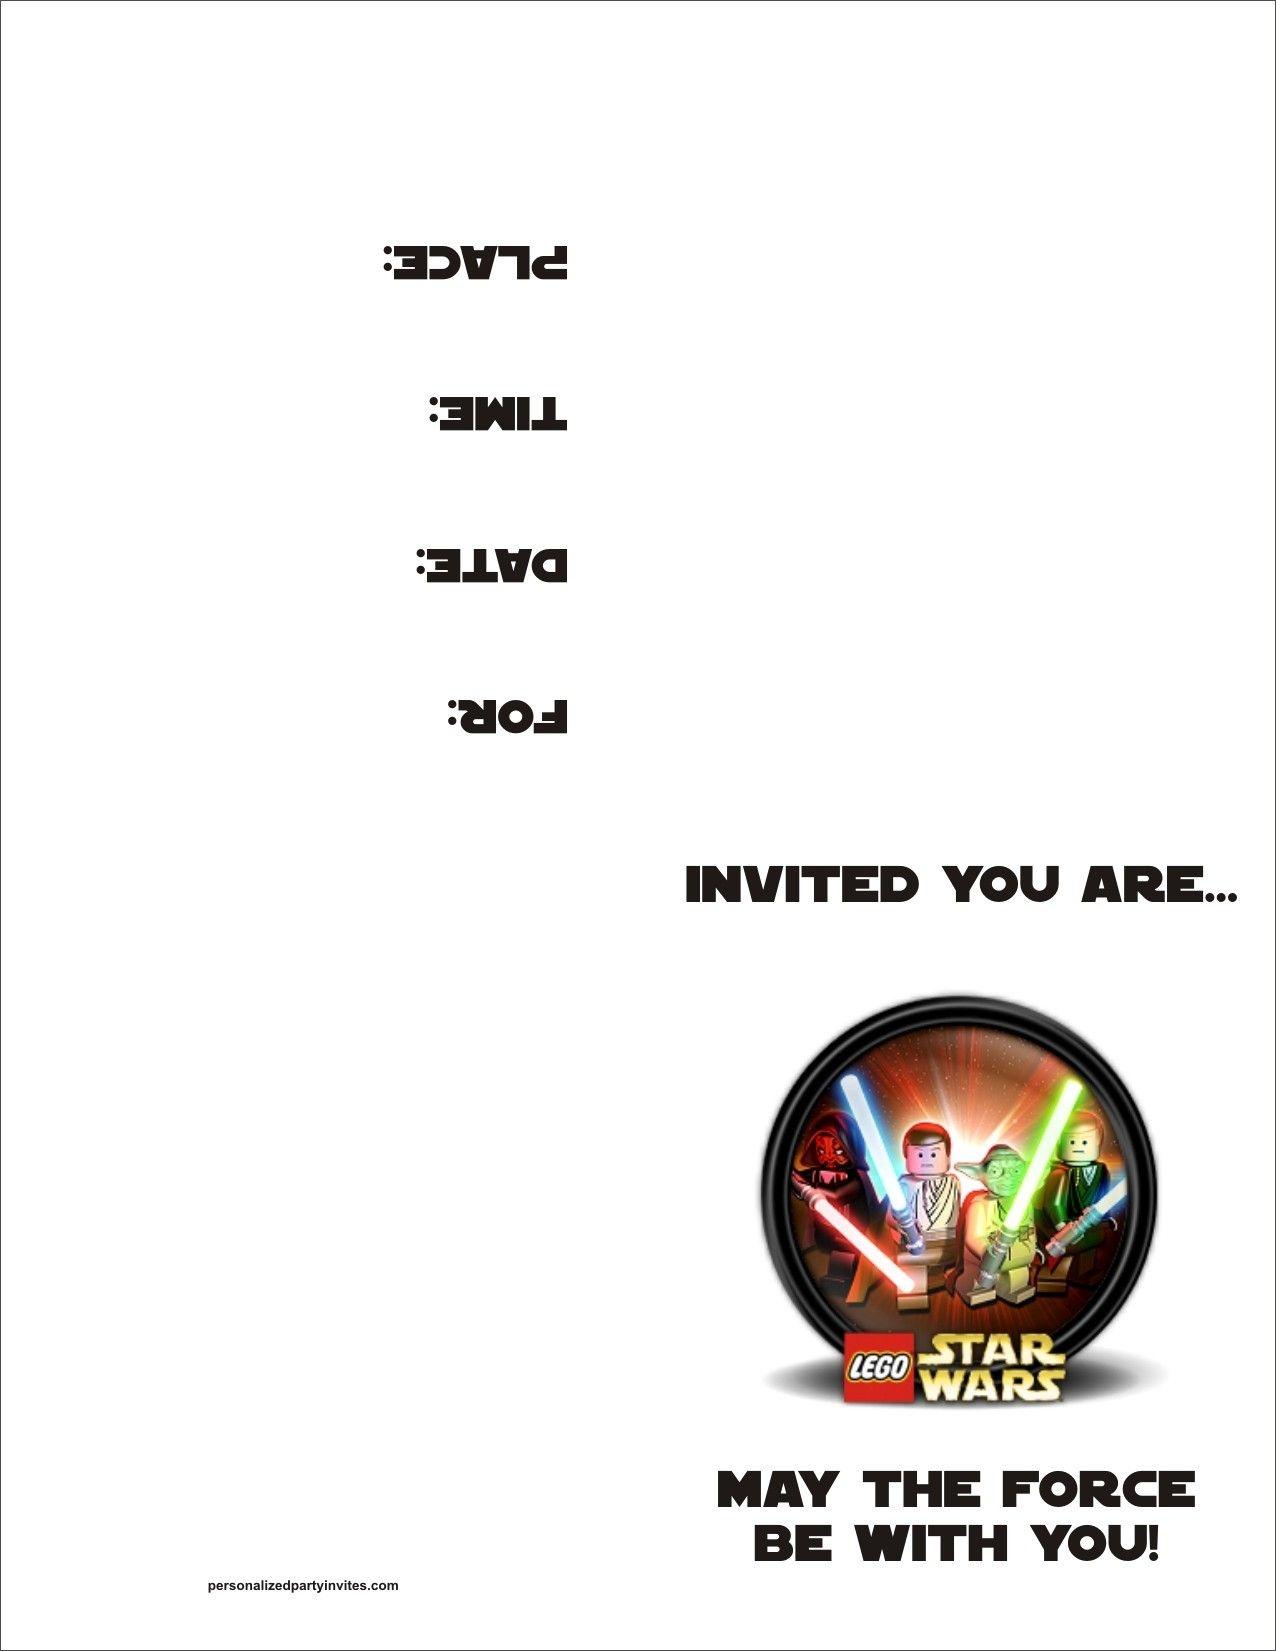 Lego+Star+Wars+Party+Invitations+Printable+Free | Costume In 2019 - Star Wars Invitations Free Printable